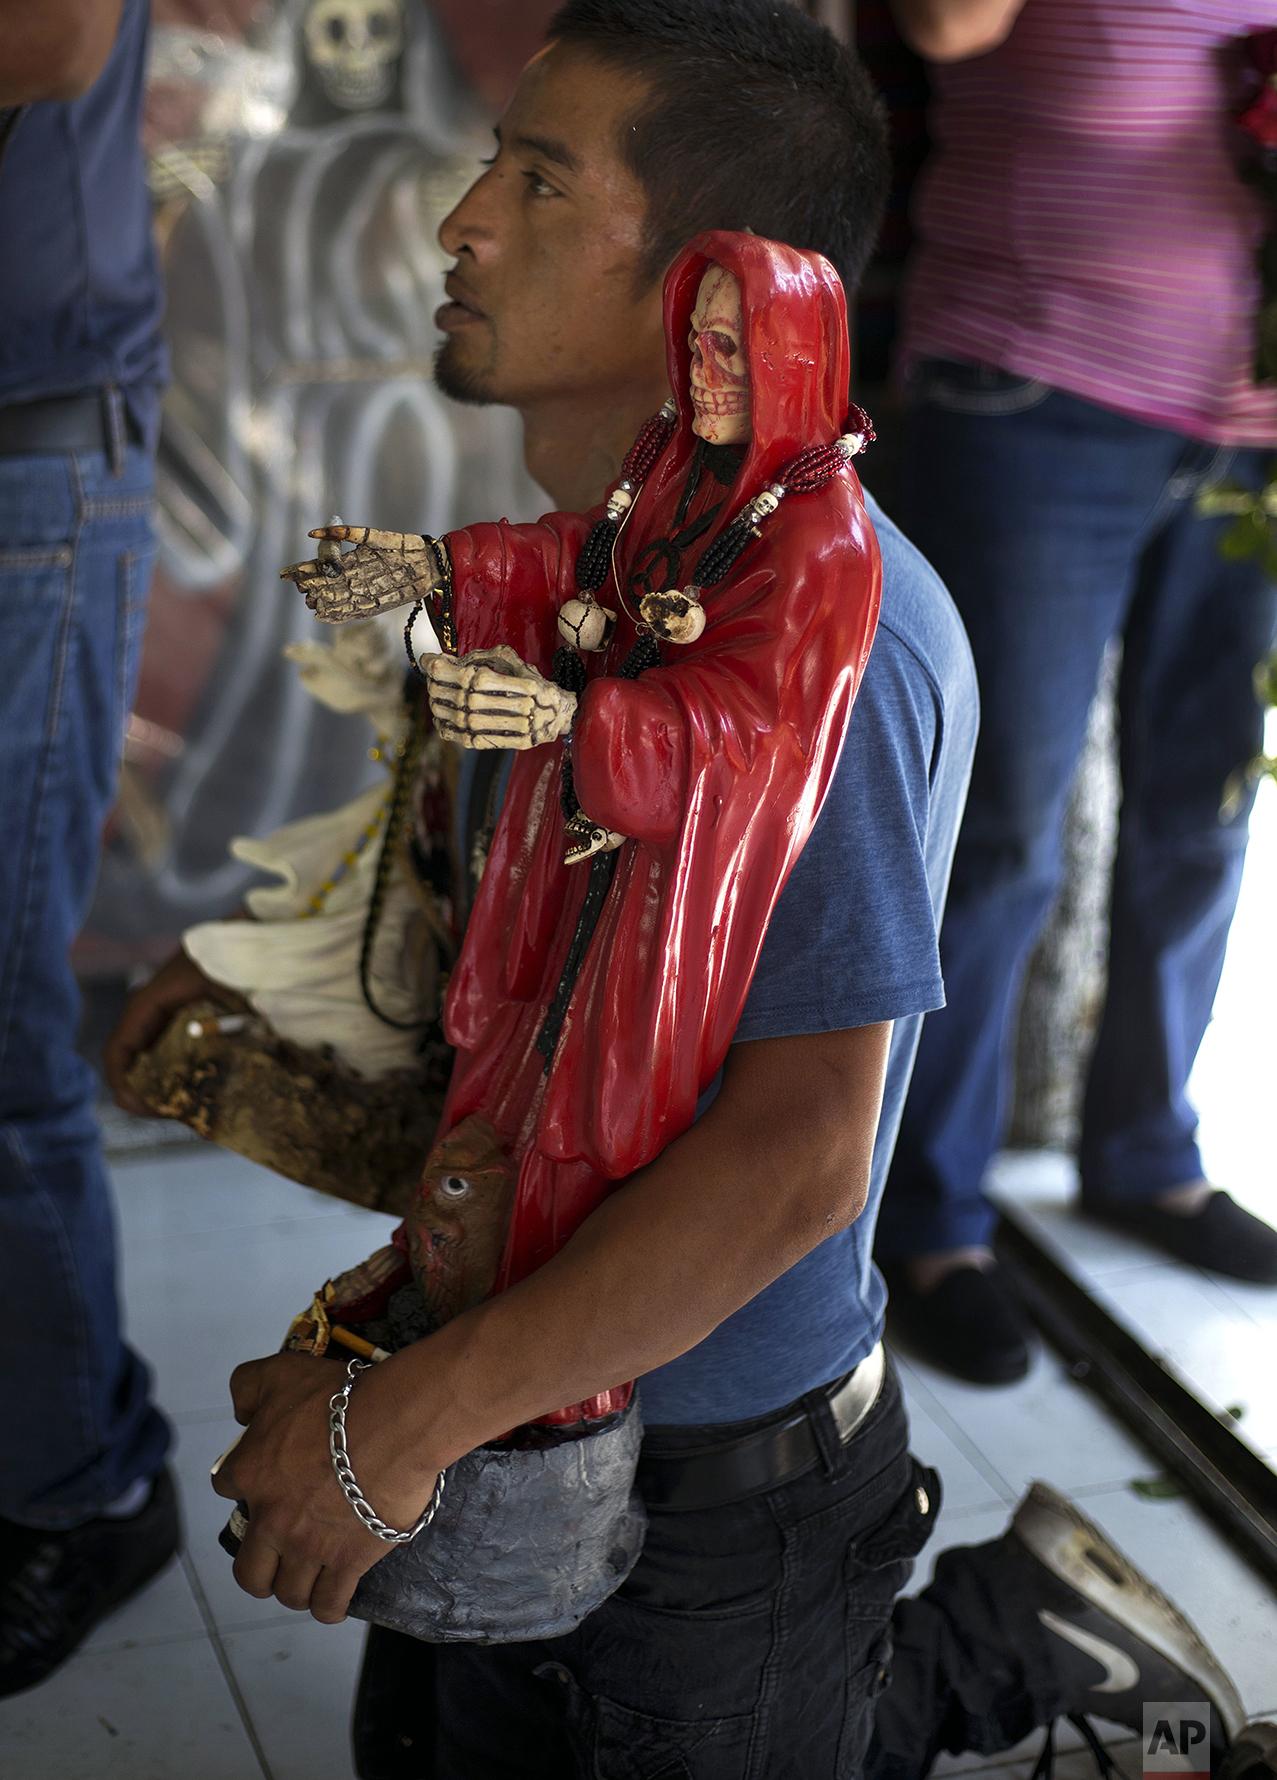 Death Saint draws followers in Mexico — AP Images Spotlight